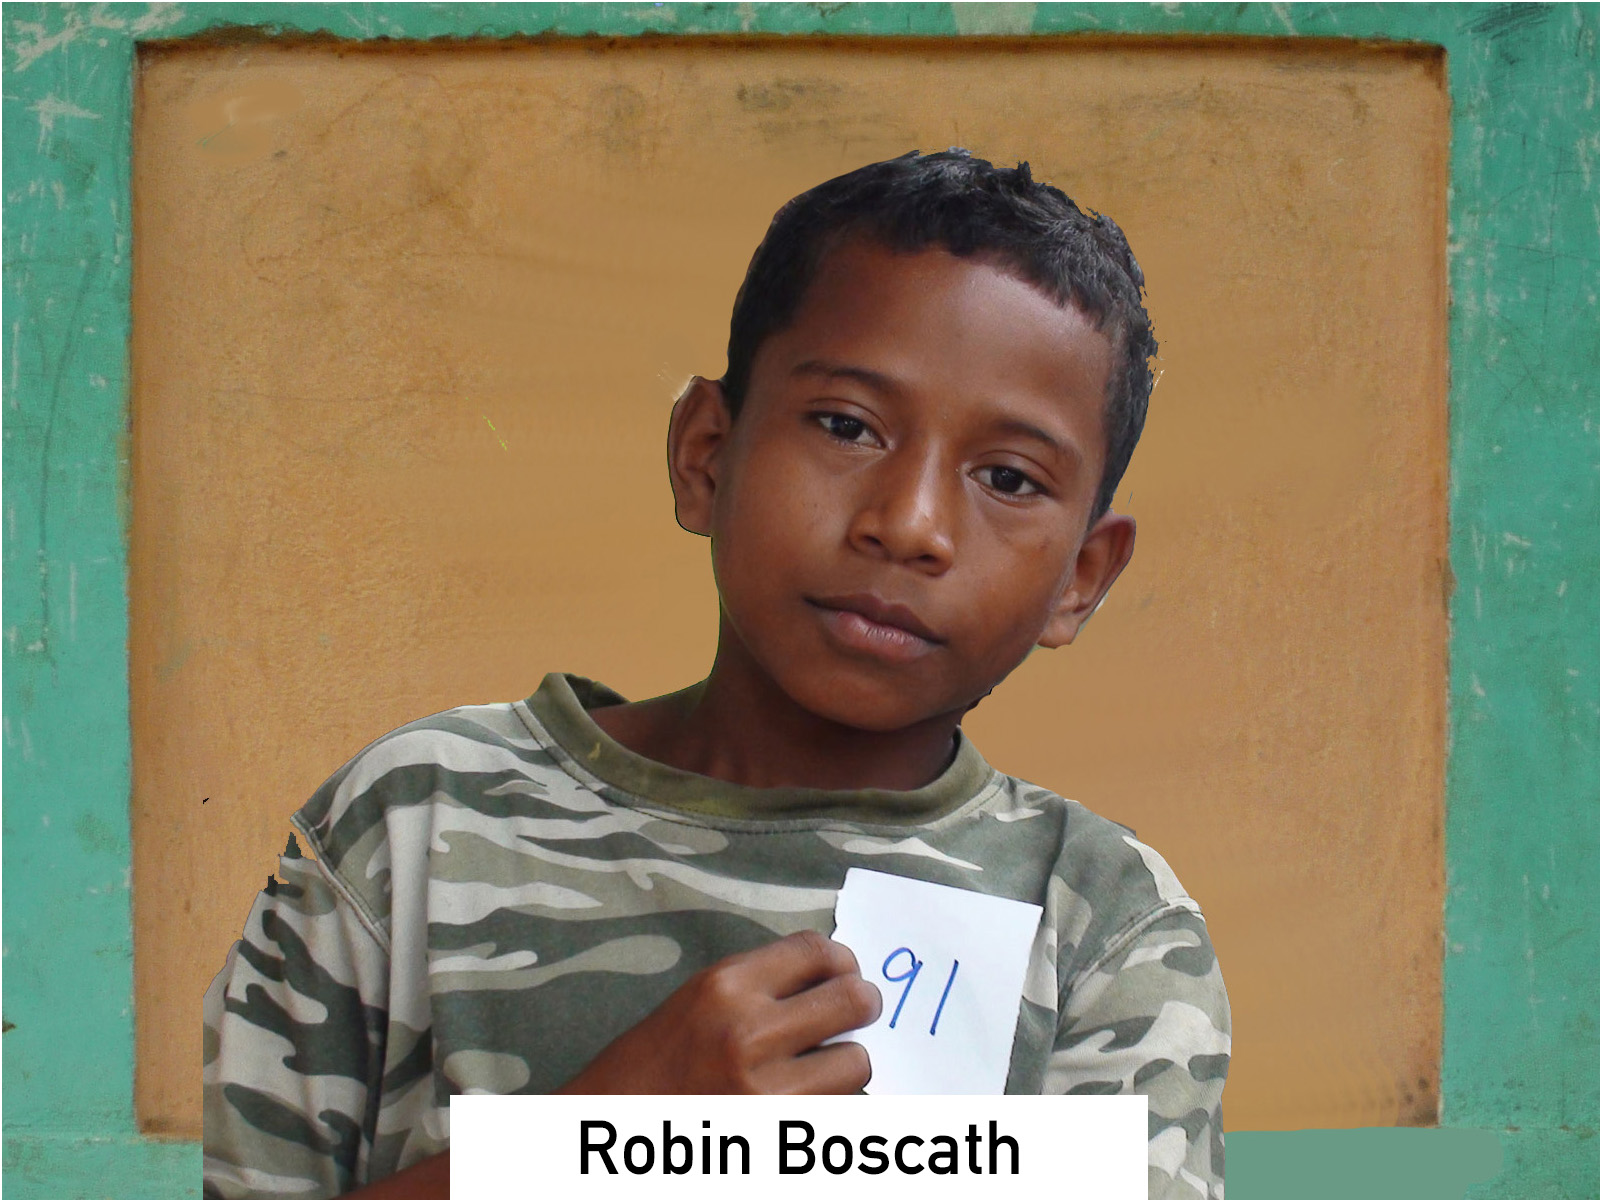 091 - Robin Boscath.jpg